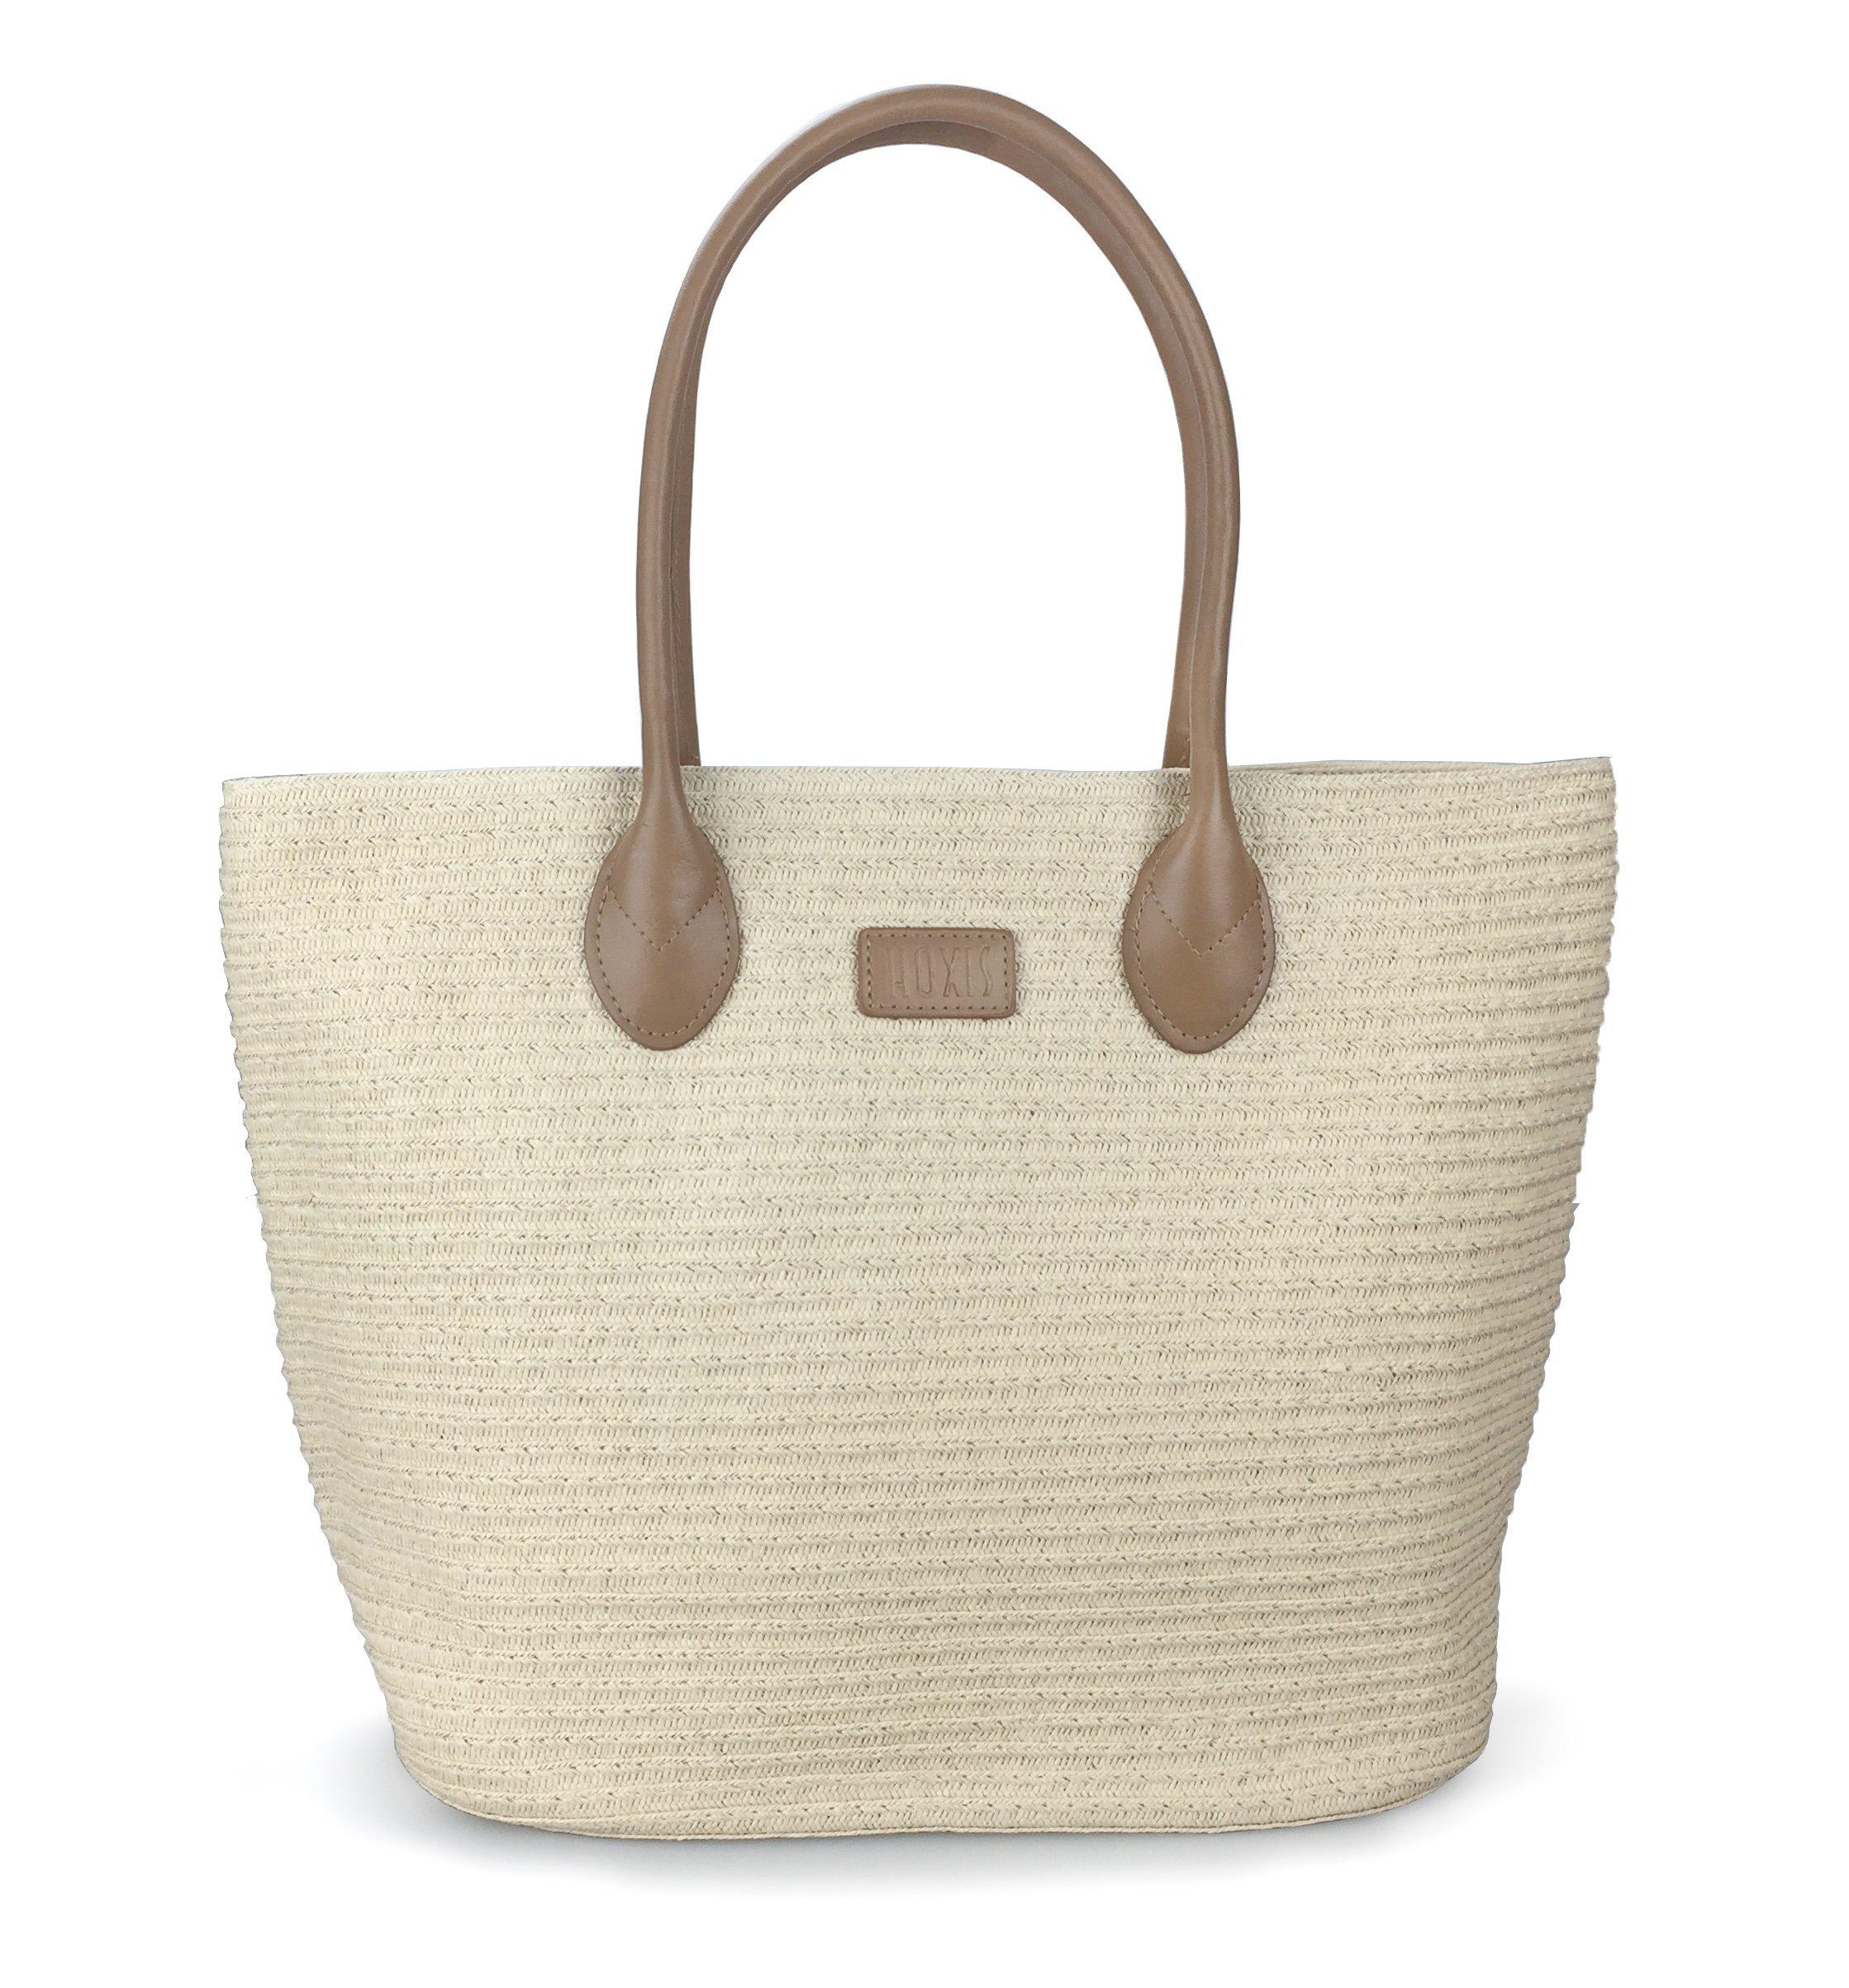 Straw Rattan Women Tote Summer Beach Shoulder Handbag Medium Size 17.8''x12.6''x5.1''(Khaki)